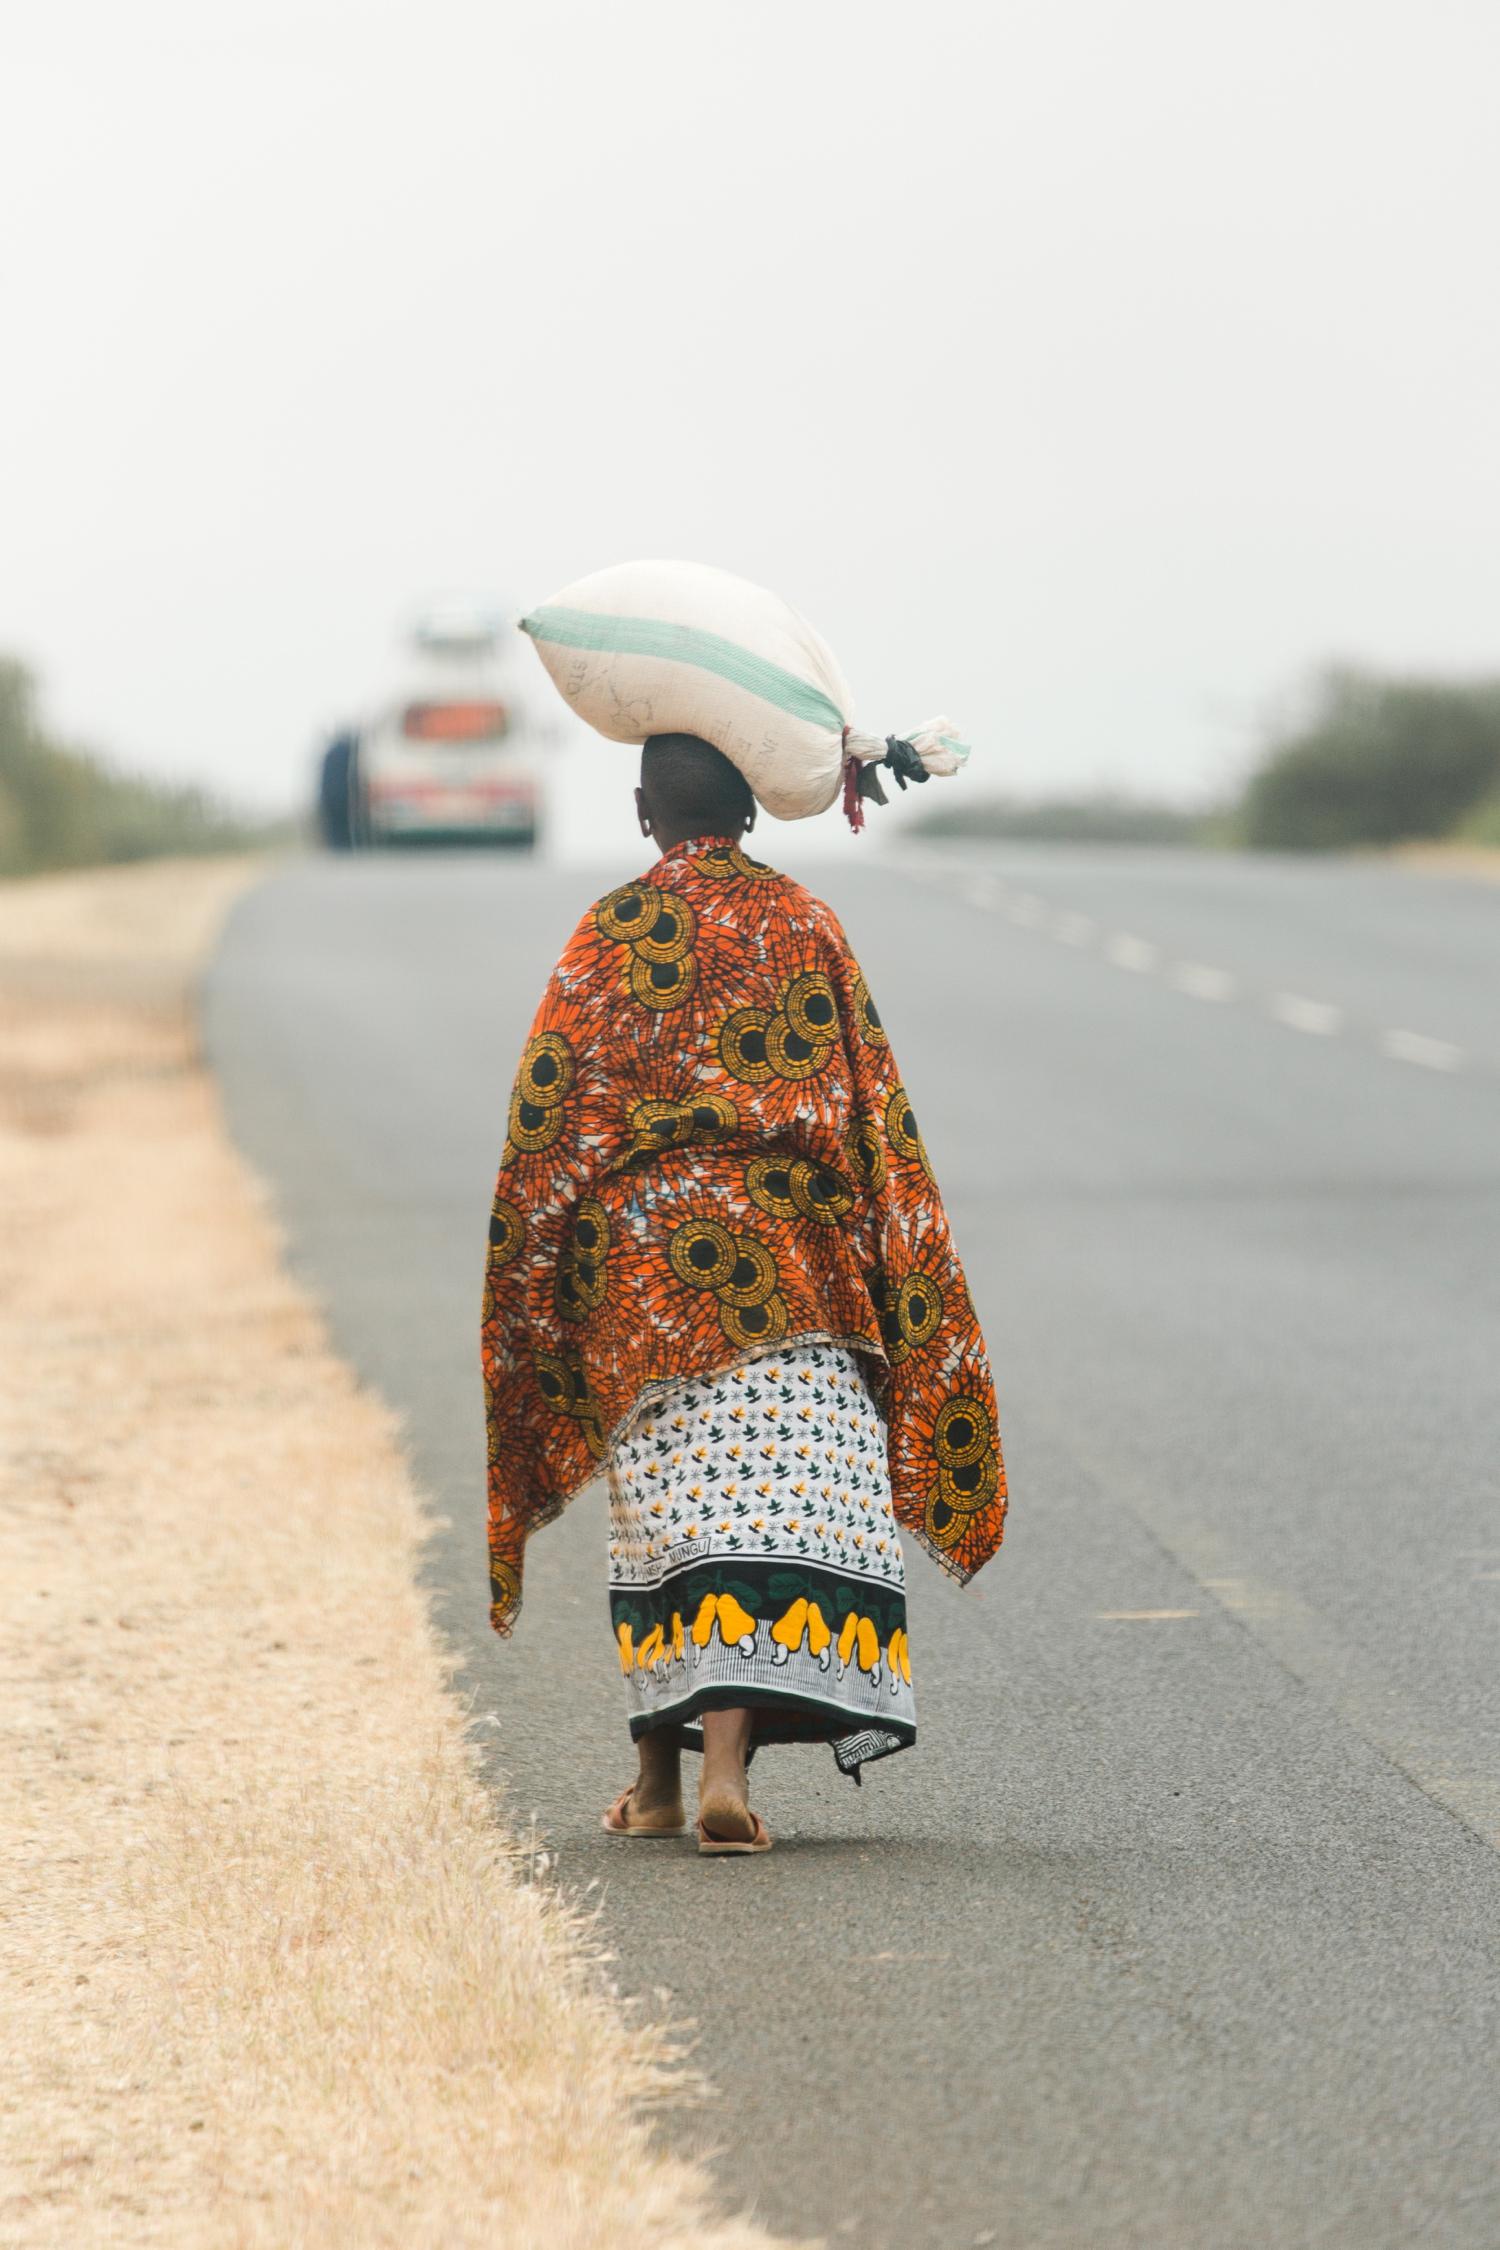 seattle-travel-photographer-cameron-zegers-tanzania.jpg